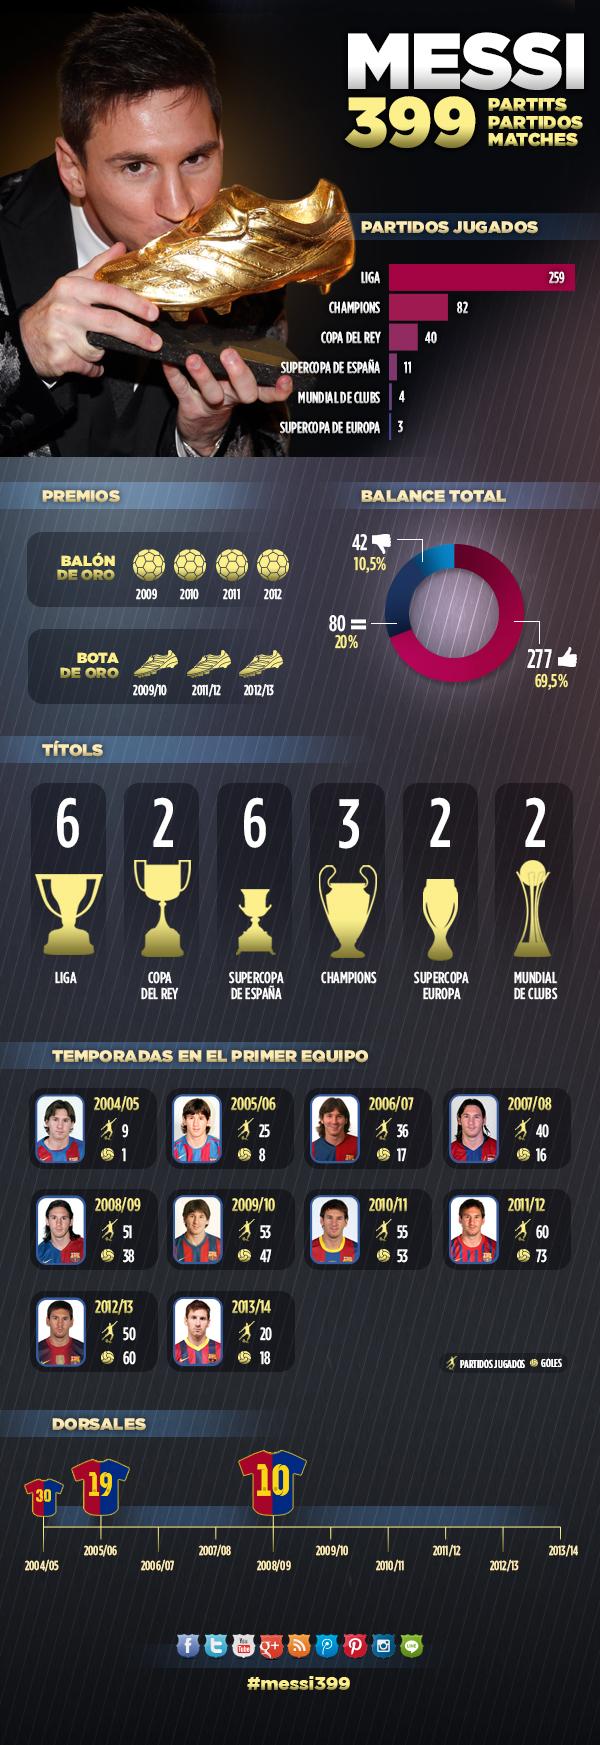 Infográfico Messi 400 partidos